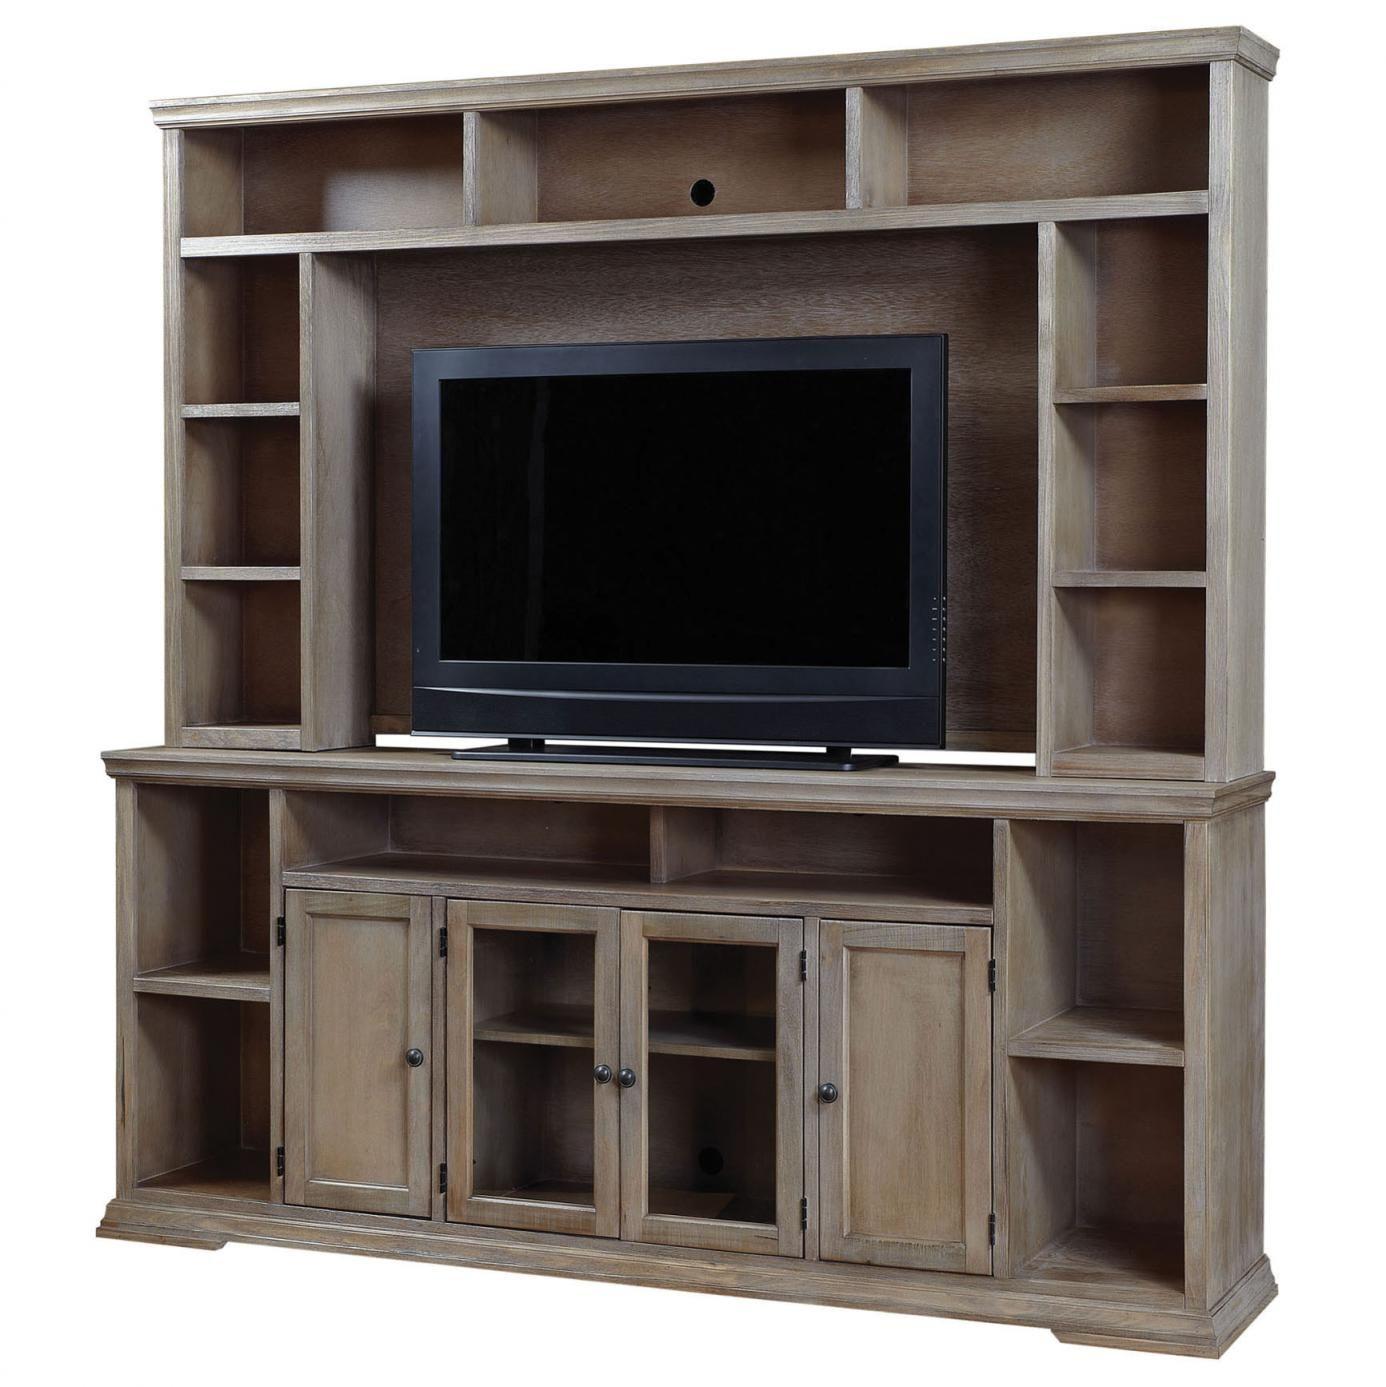 Aspenhome canyon creek inch console with hutch furniture u home